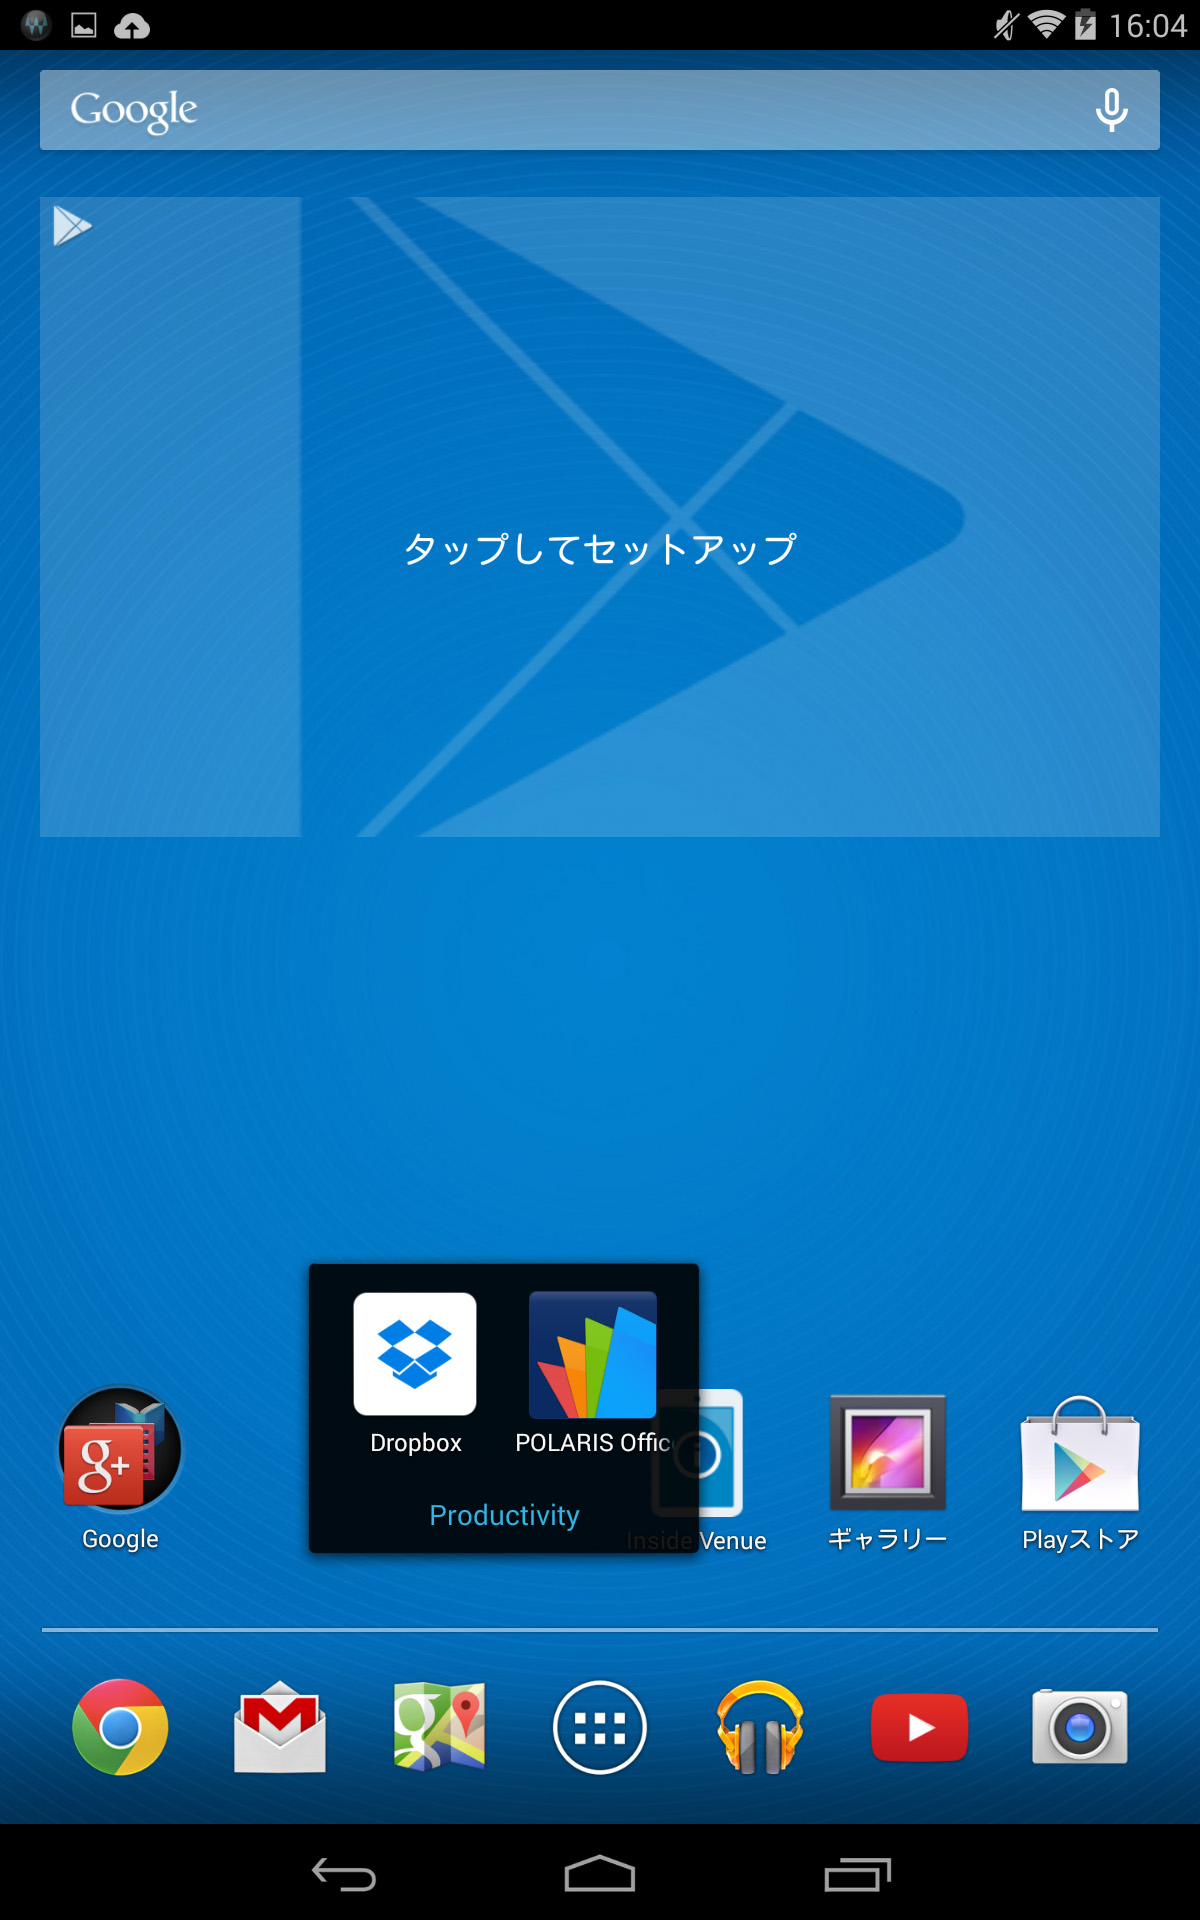 Productivityフォルダ。DropboxとPOLARIS Office 5